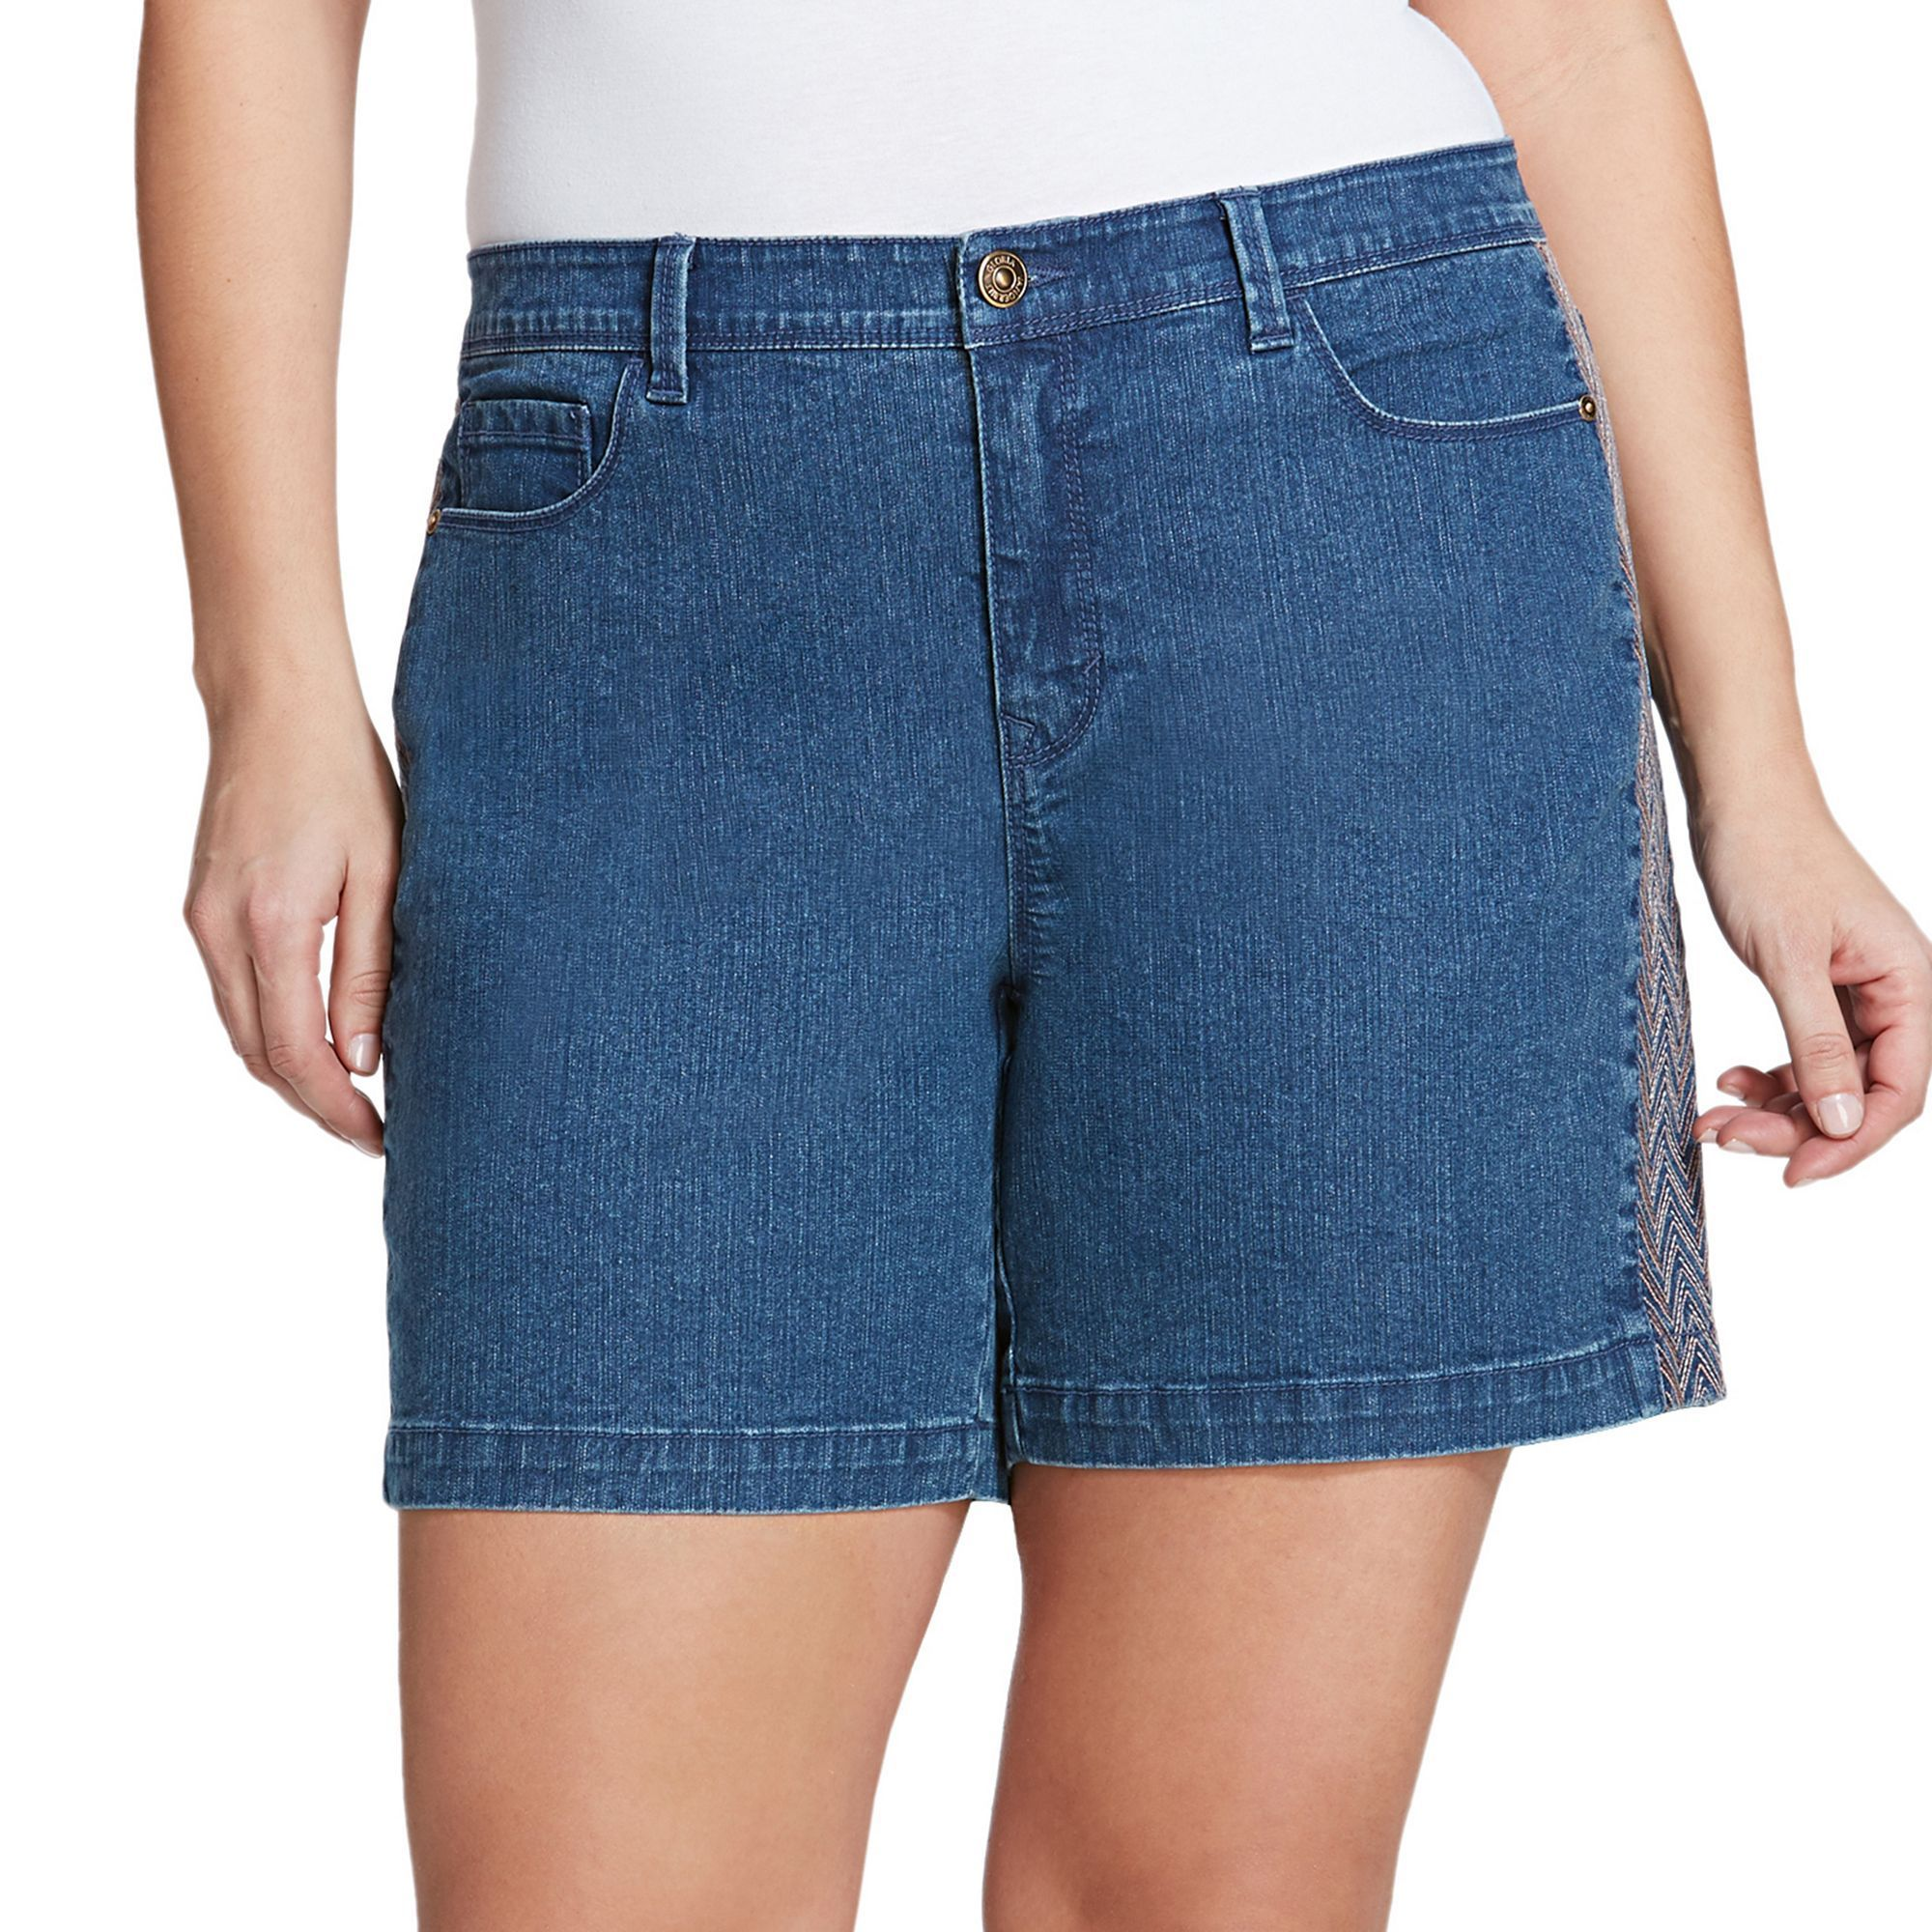 Plus Size Gloria Vanderbilt Danica Bermuda Jean Shorts, Women's, Size: 18 W, Light Blue